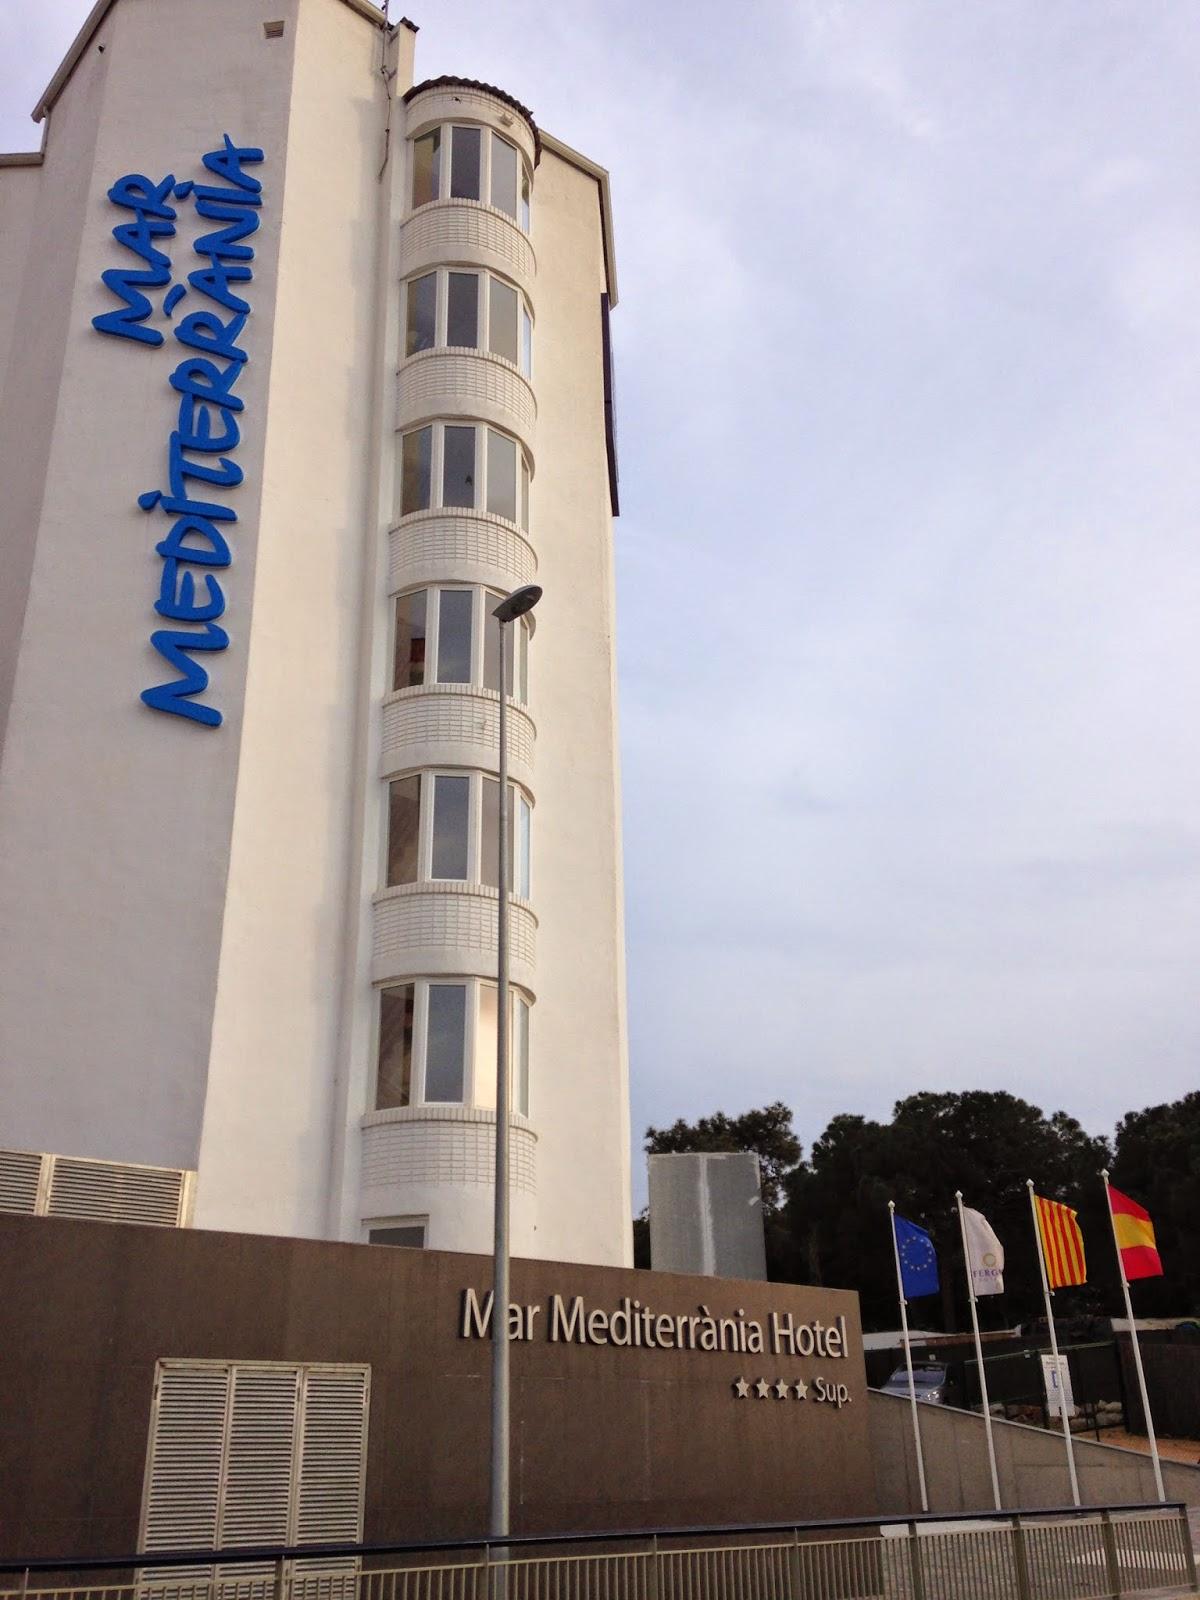 Fergus Hotel Mar Mediterrania Santa Susanna Spain exterior building